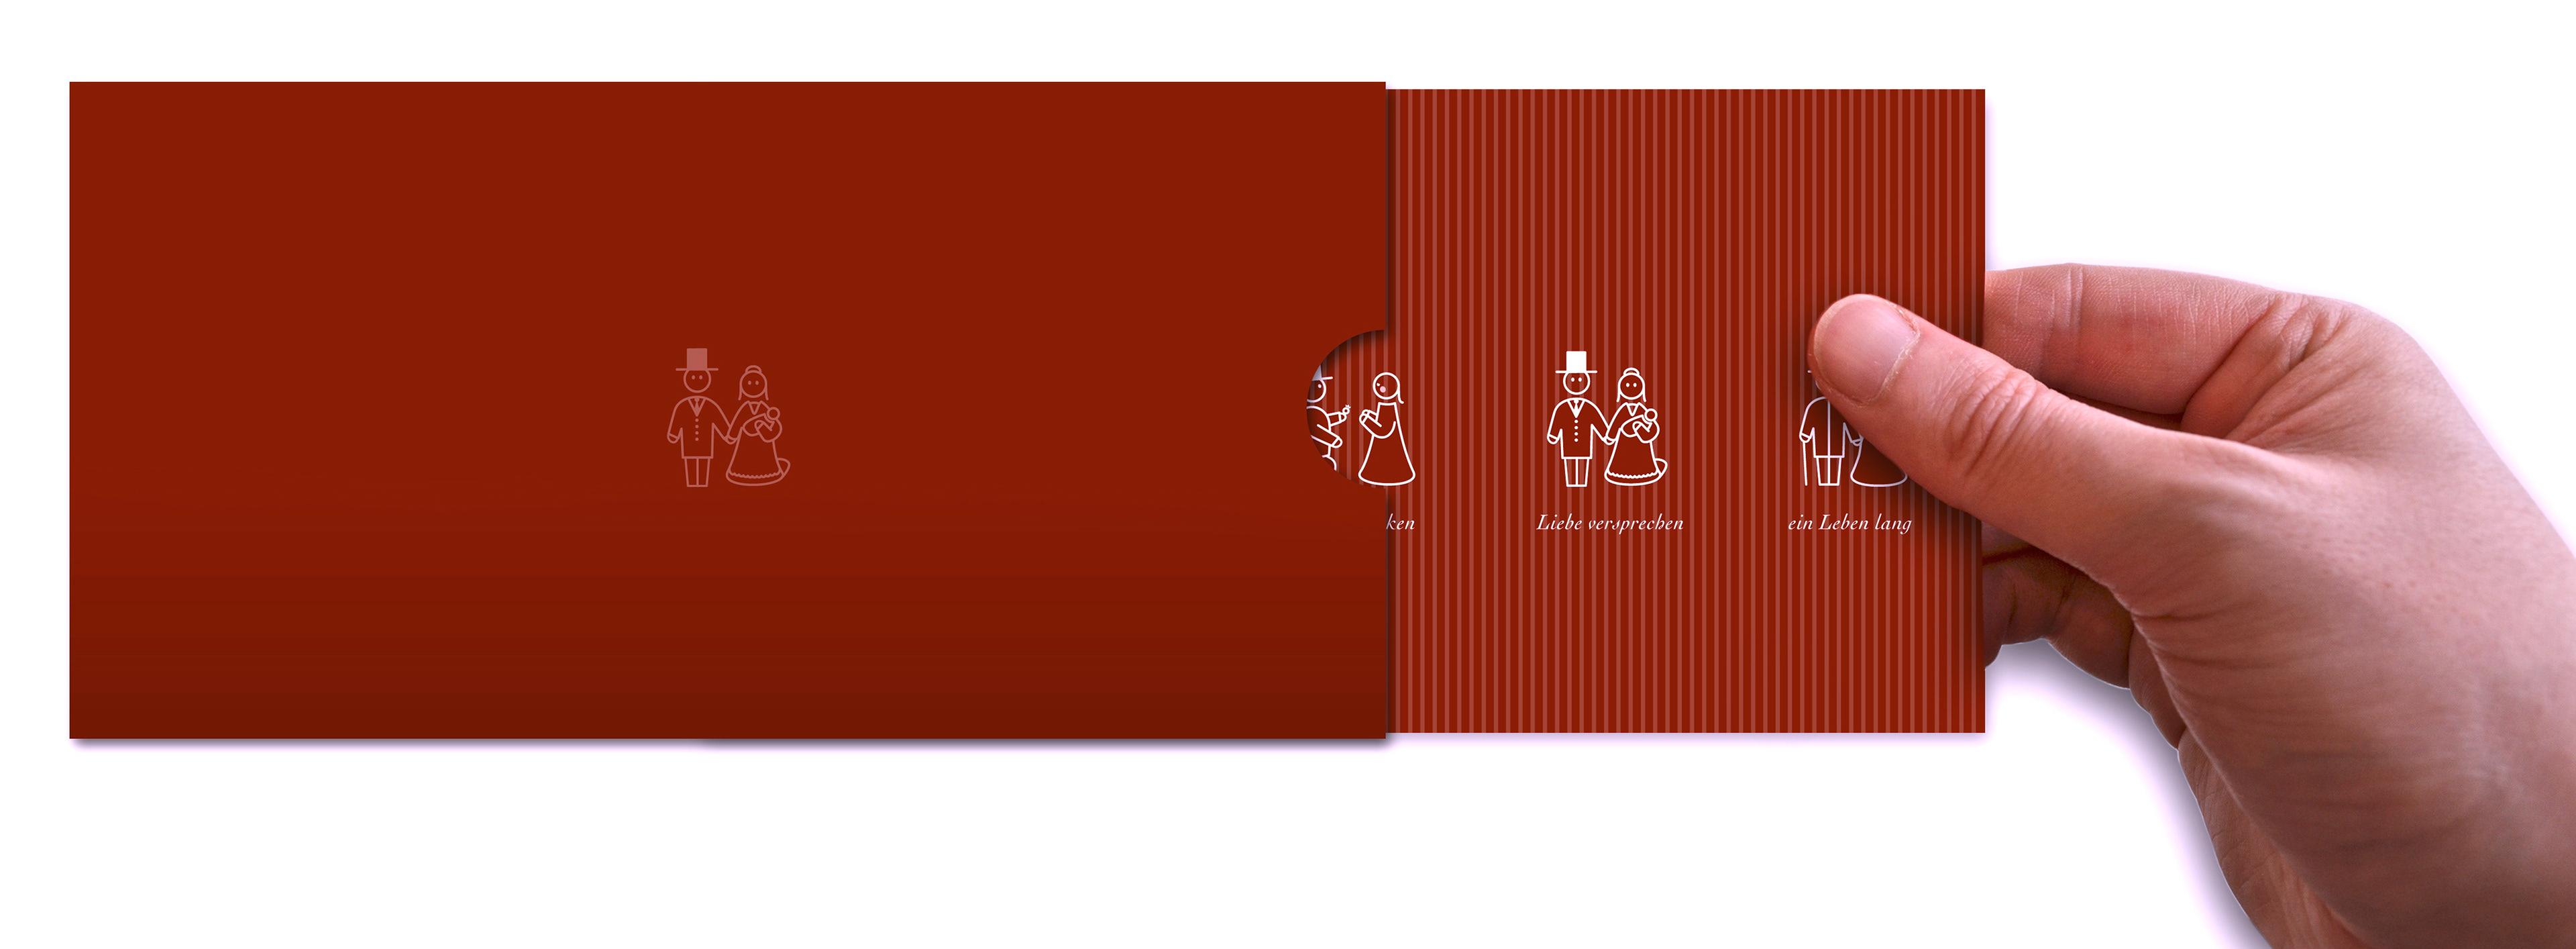 Björn Musyal - Communication Design - Line Art Wedding Invitation